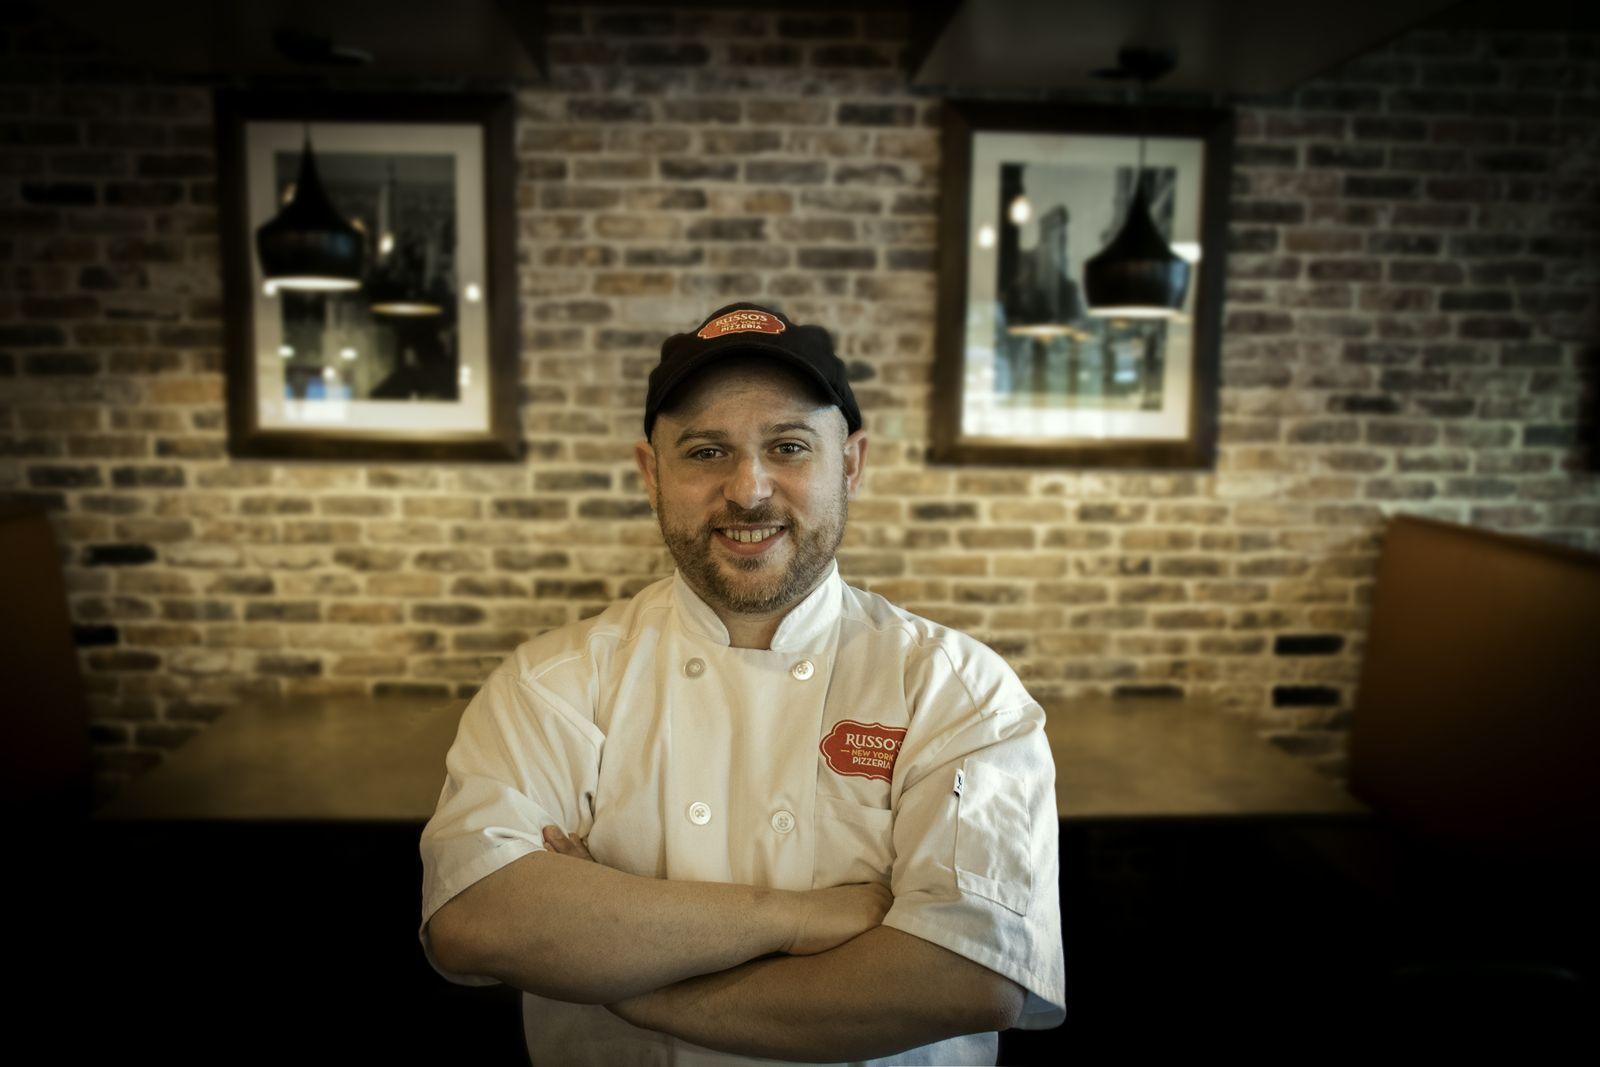 Russo's Restaurants Names Two-Time World Champion Pizza Maker Vincenzo Lavecchia as Corporate Chef